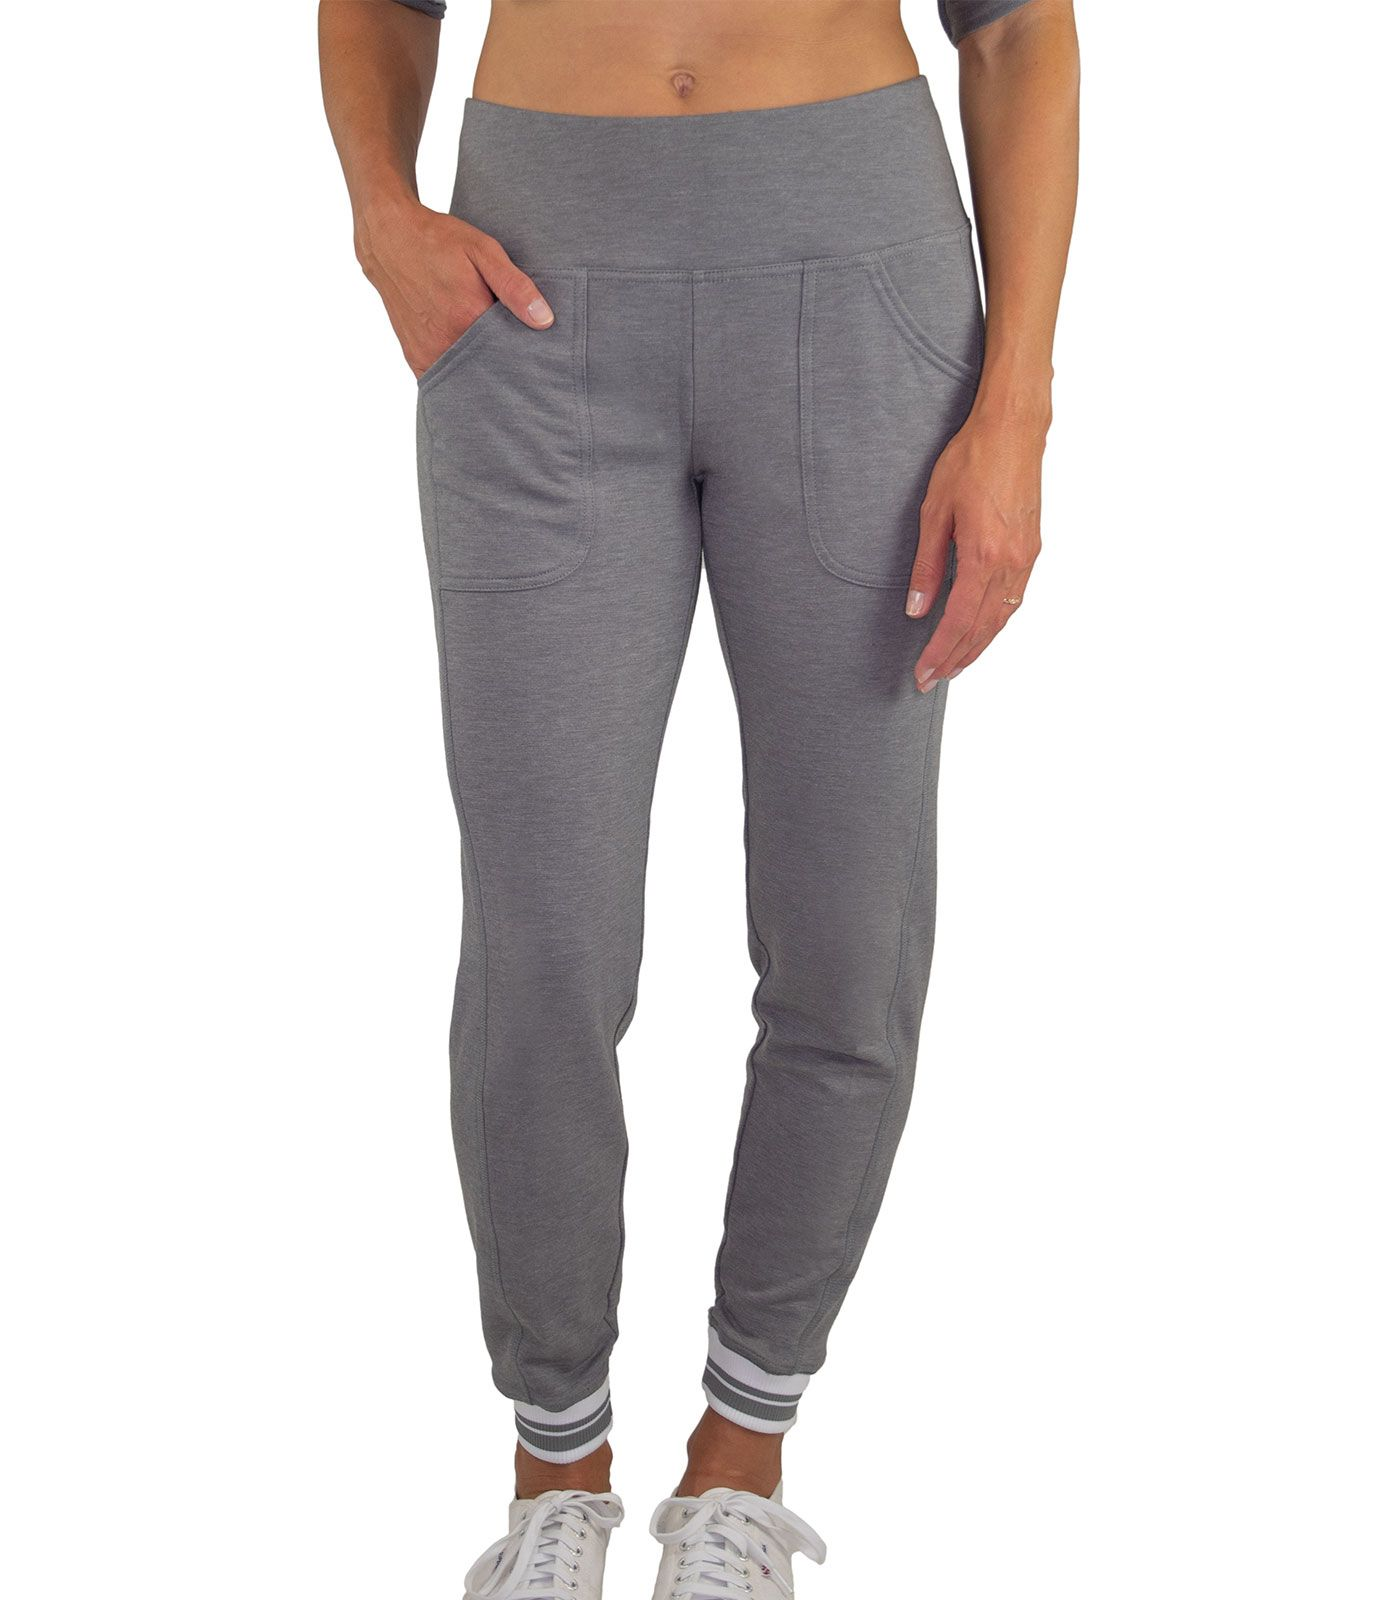 Jofit Women's Ribbed Chalet Golf Pants